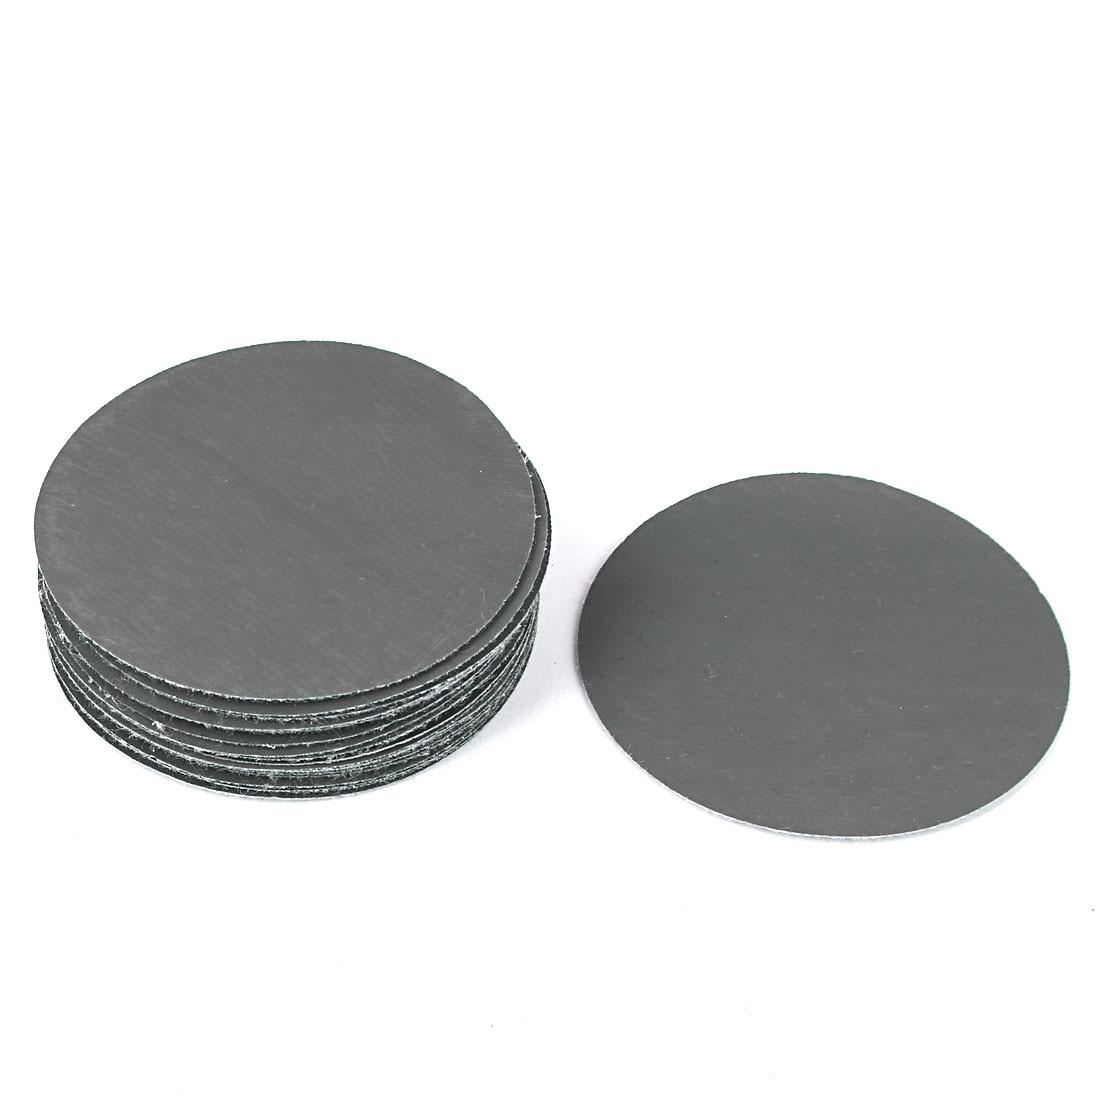 "UXCELL 3"" Dia 3000 Grit Abrasive Round Sanding Disc Sandpaper 20Pcs For Oscillating Tool"